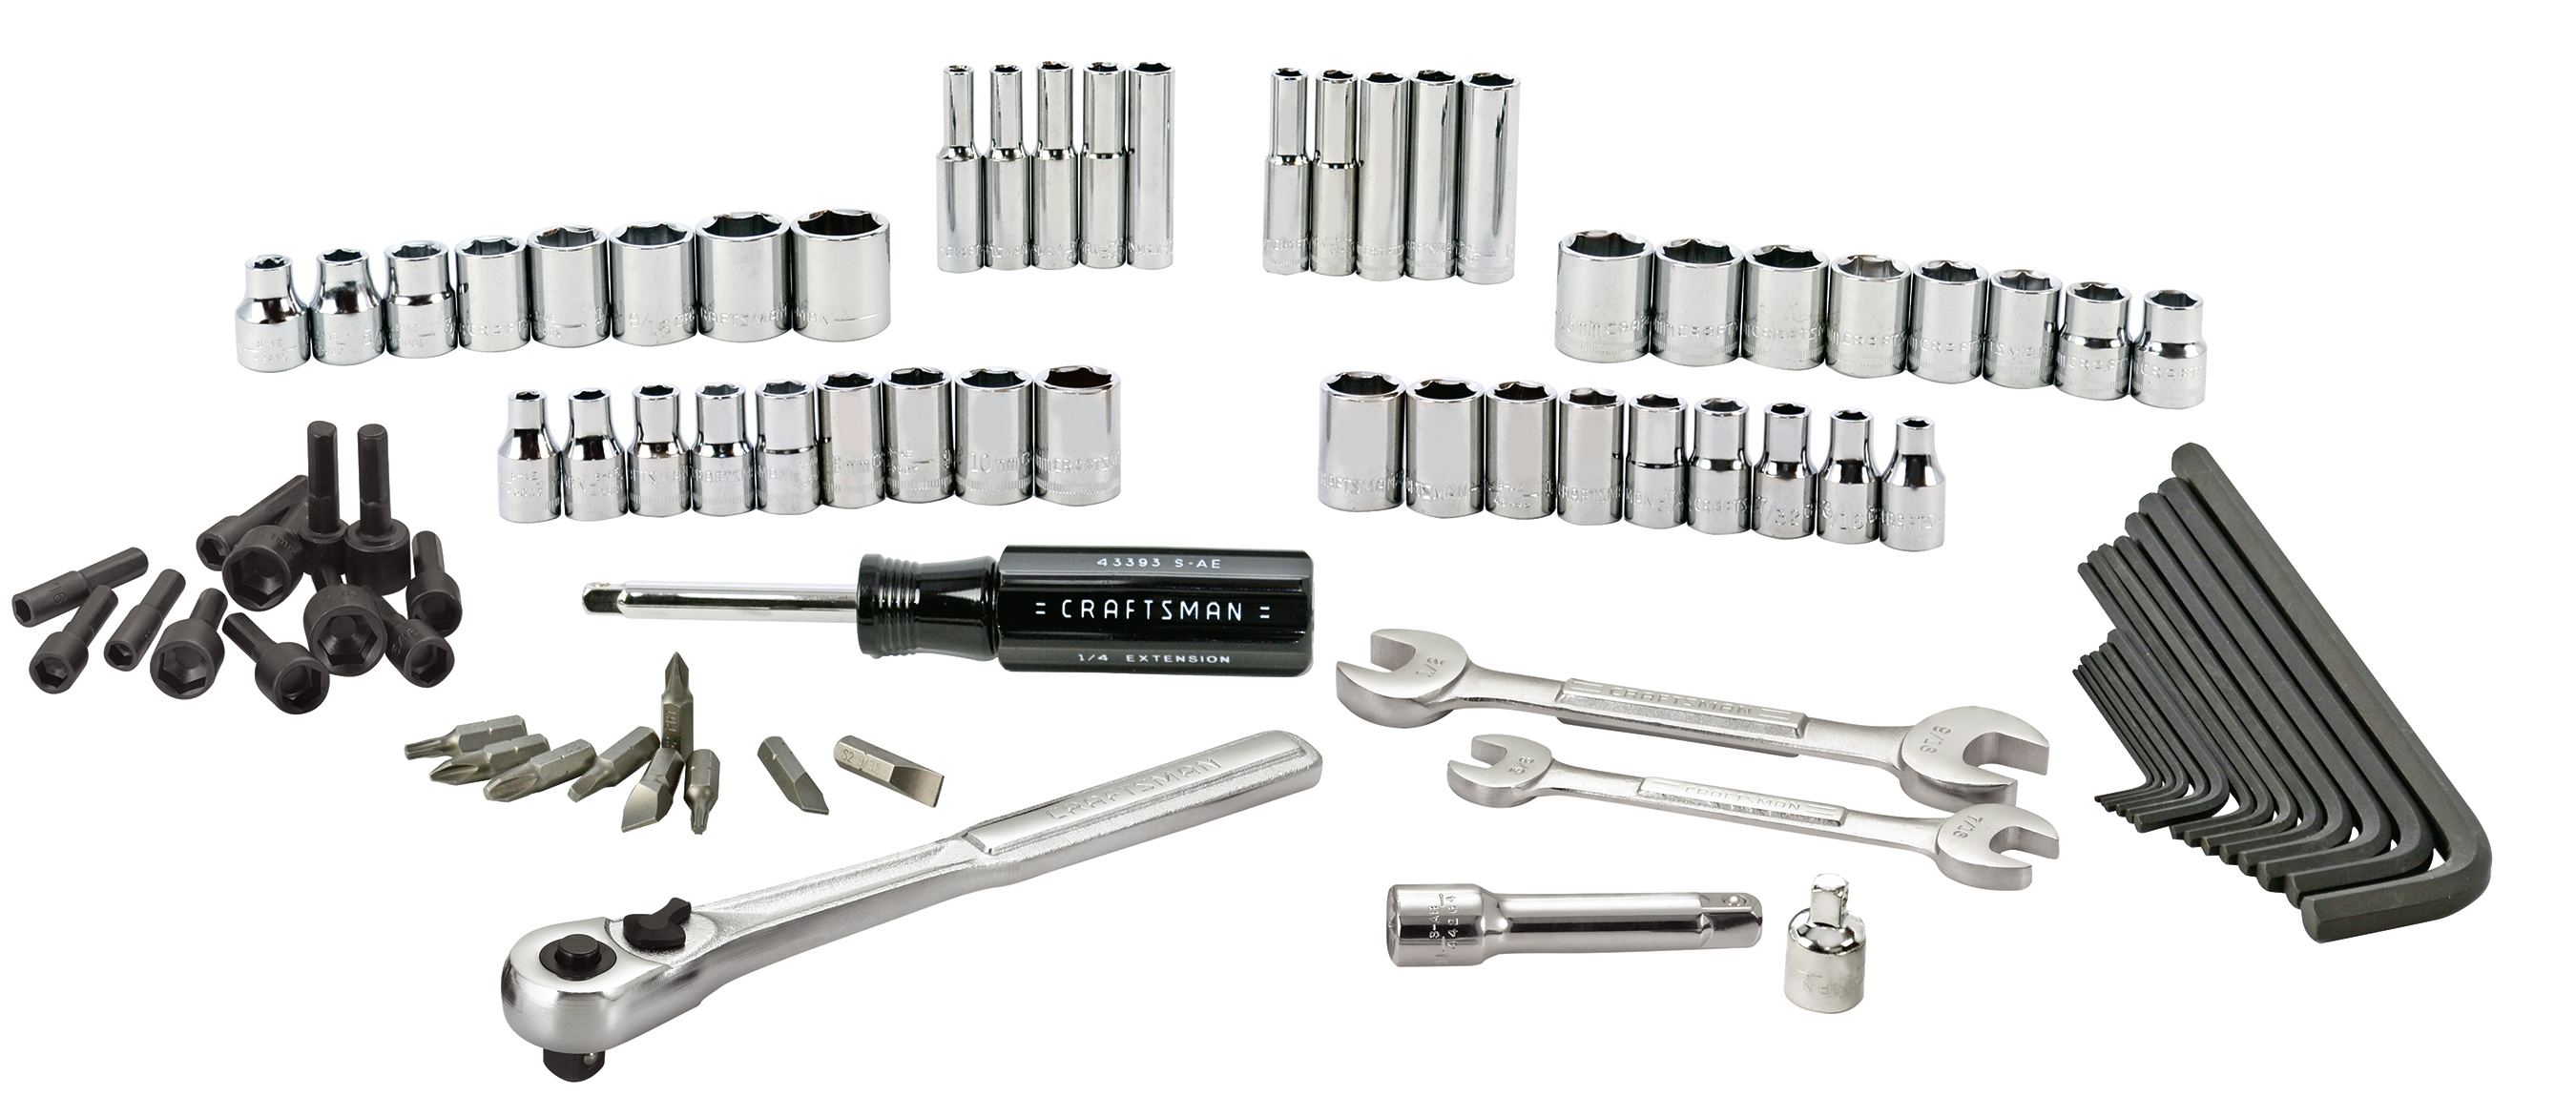 Craftsman 85-pc Mechanics Tool Set